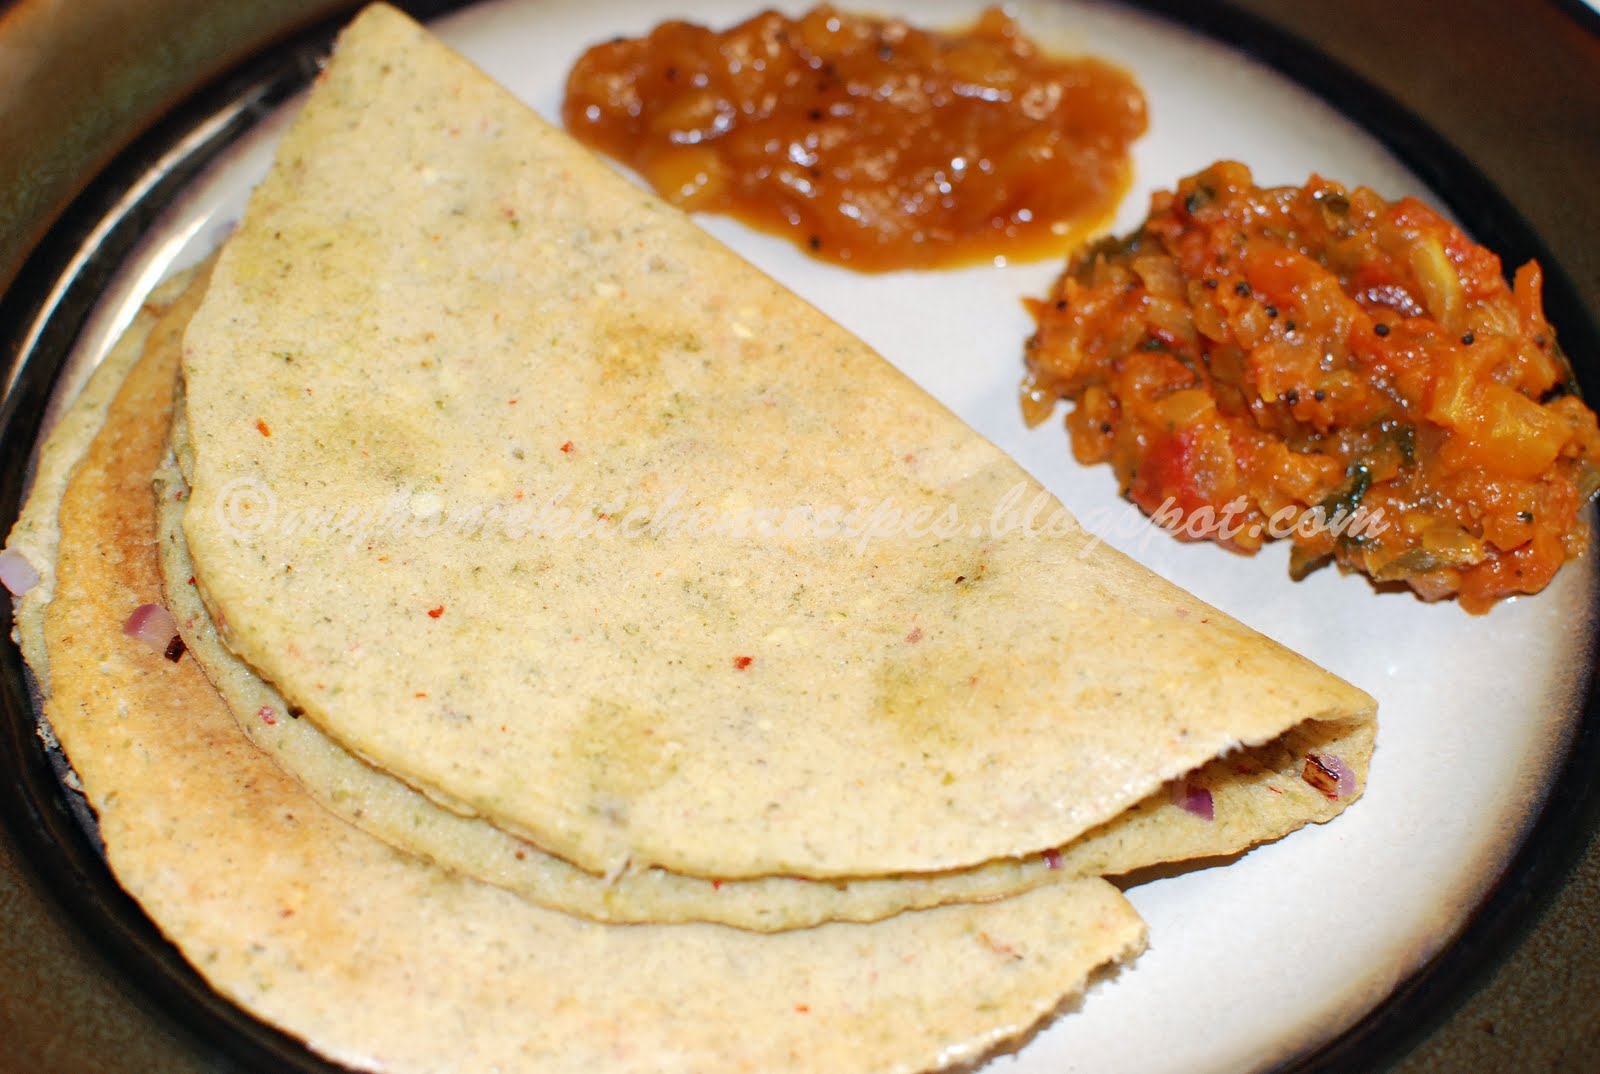 Mixed Lentil Adai Indian Breakfast Dinner Recipe From